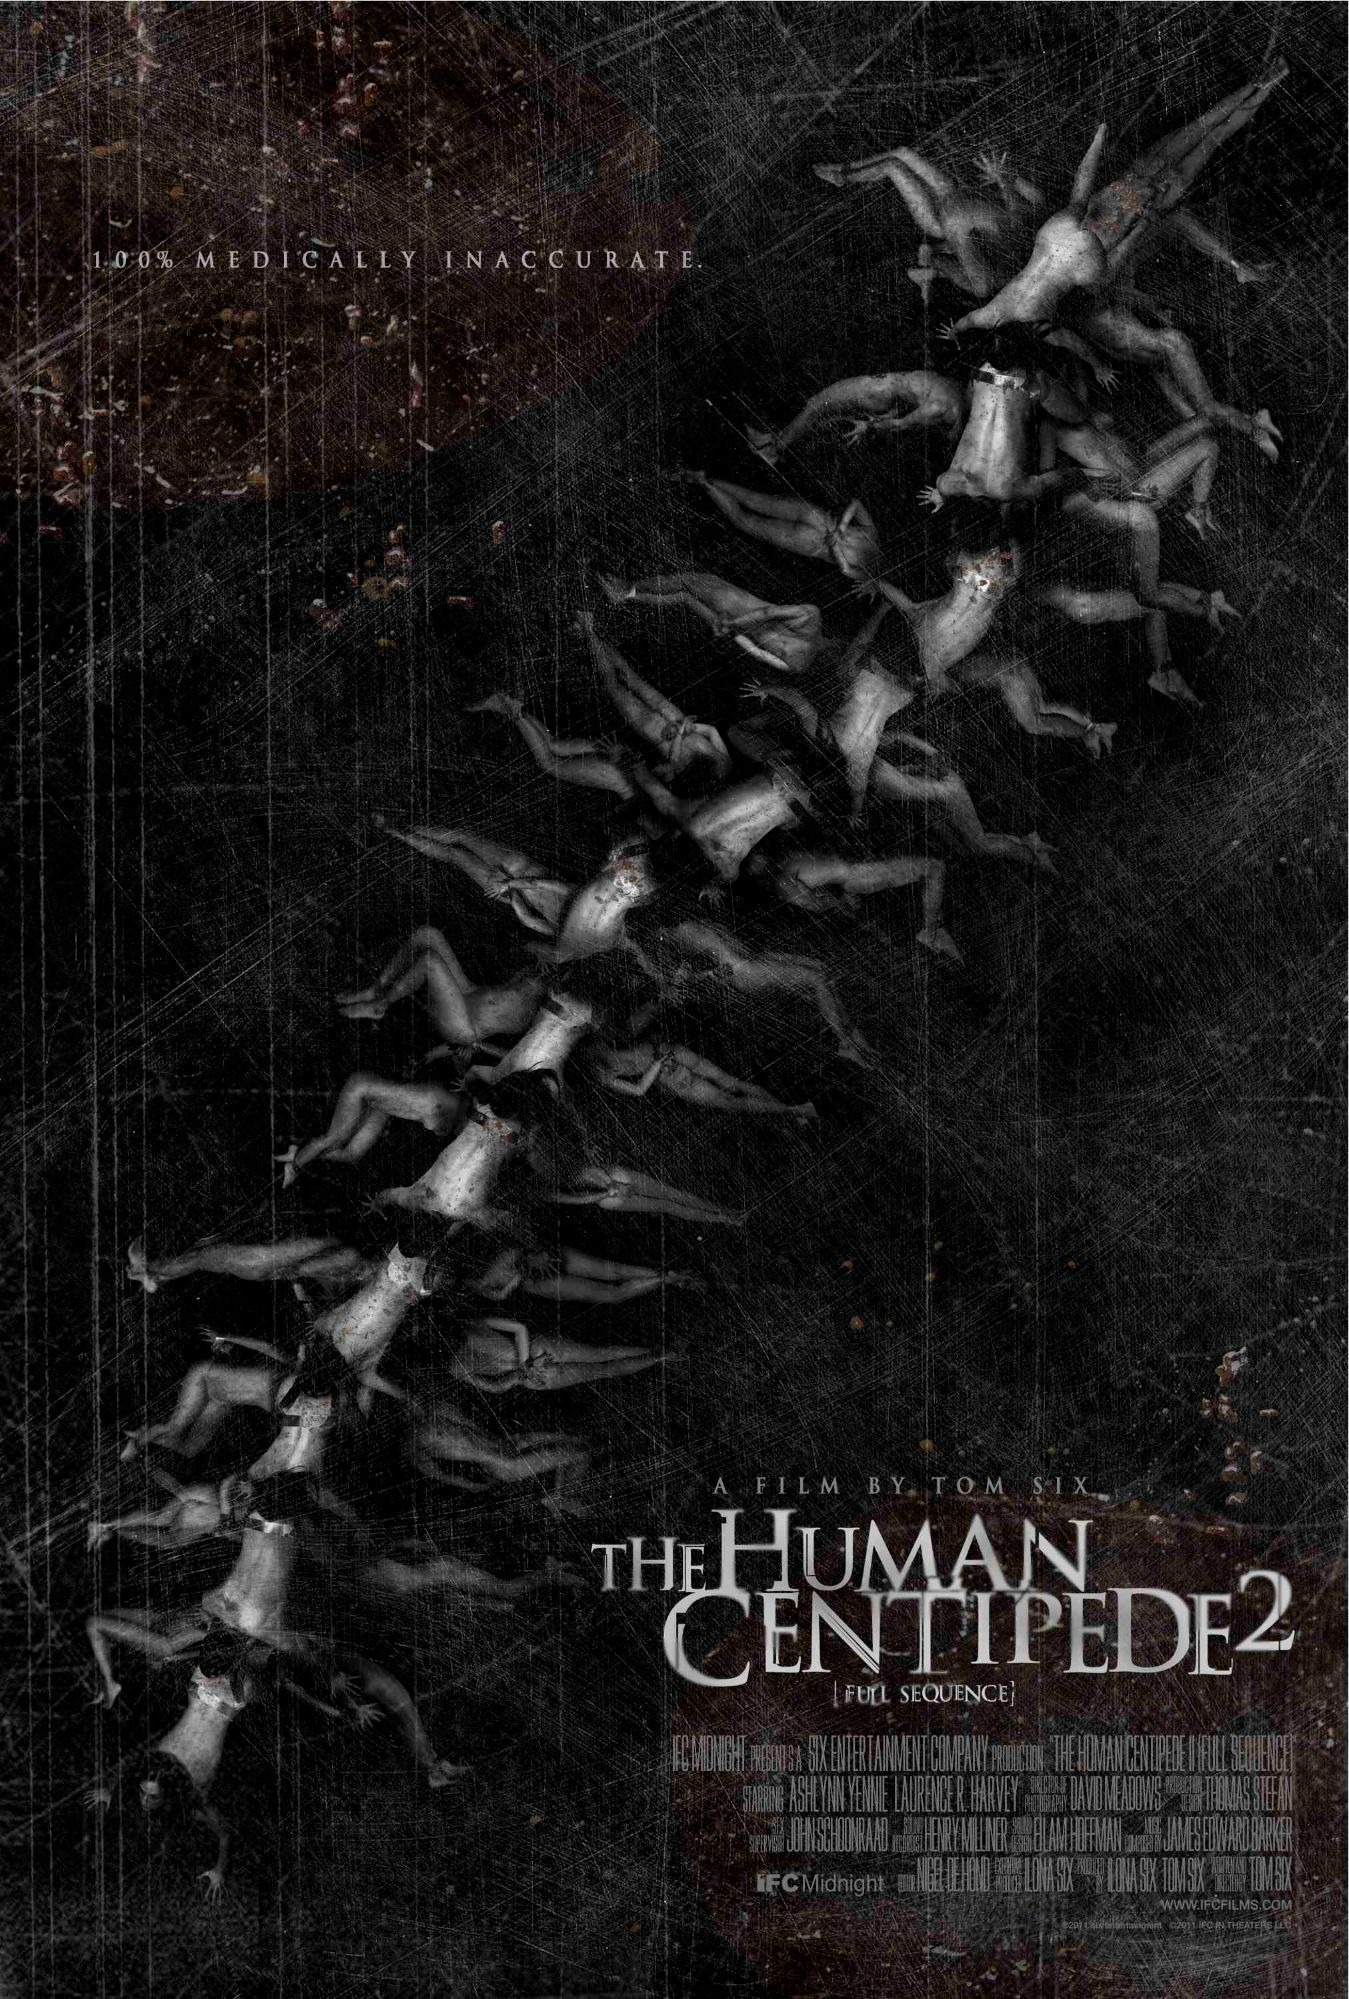 the-human-centipede-2-poster-1617728049.jpg